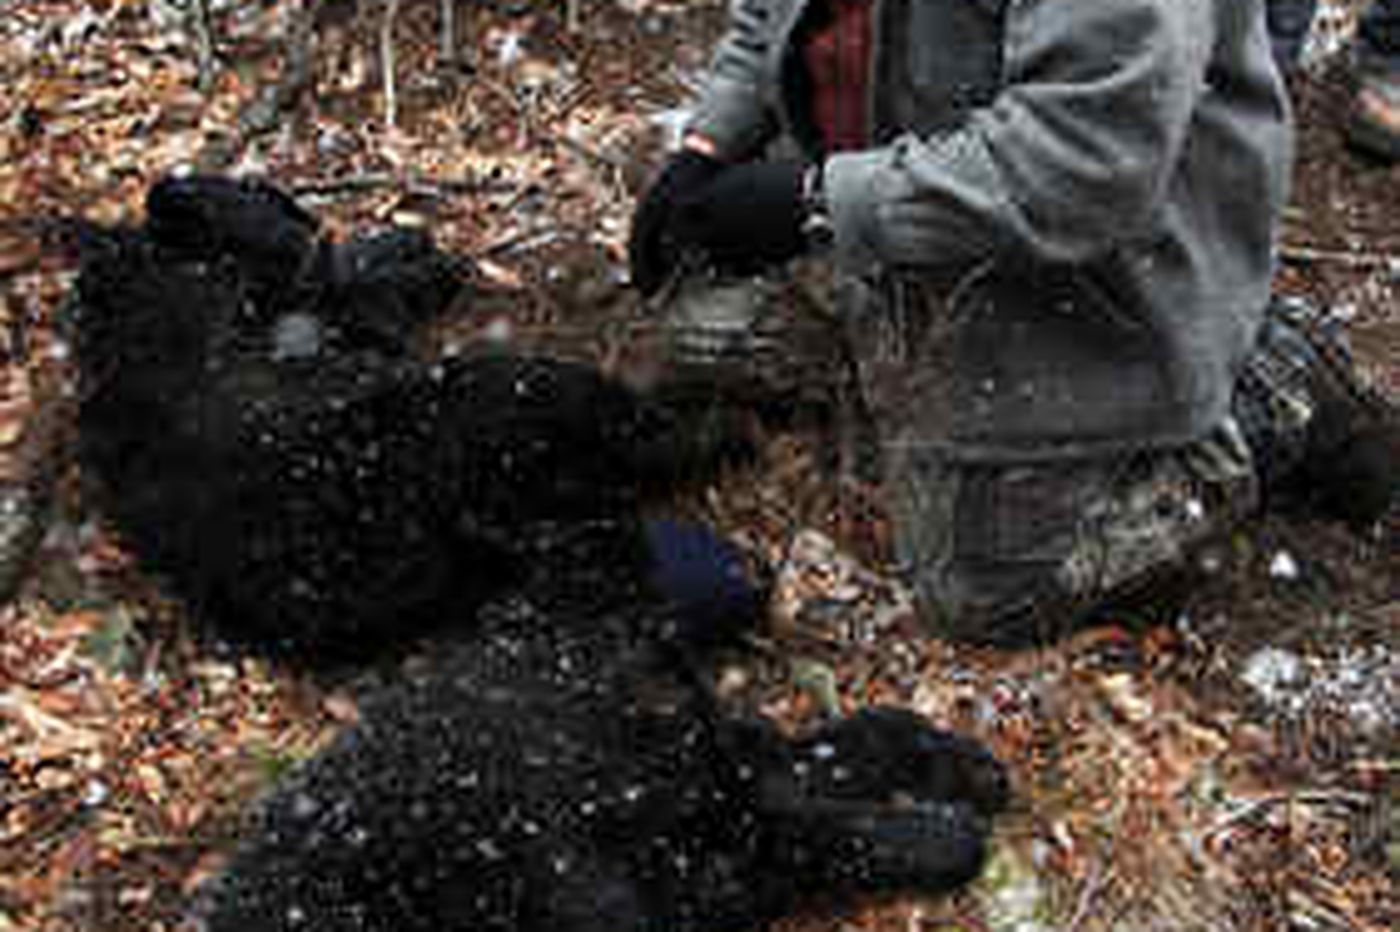 Pa.'s black bear population steadily increasing